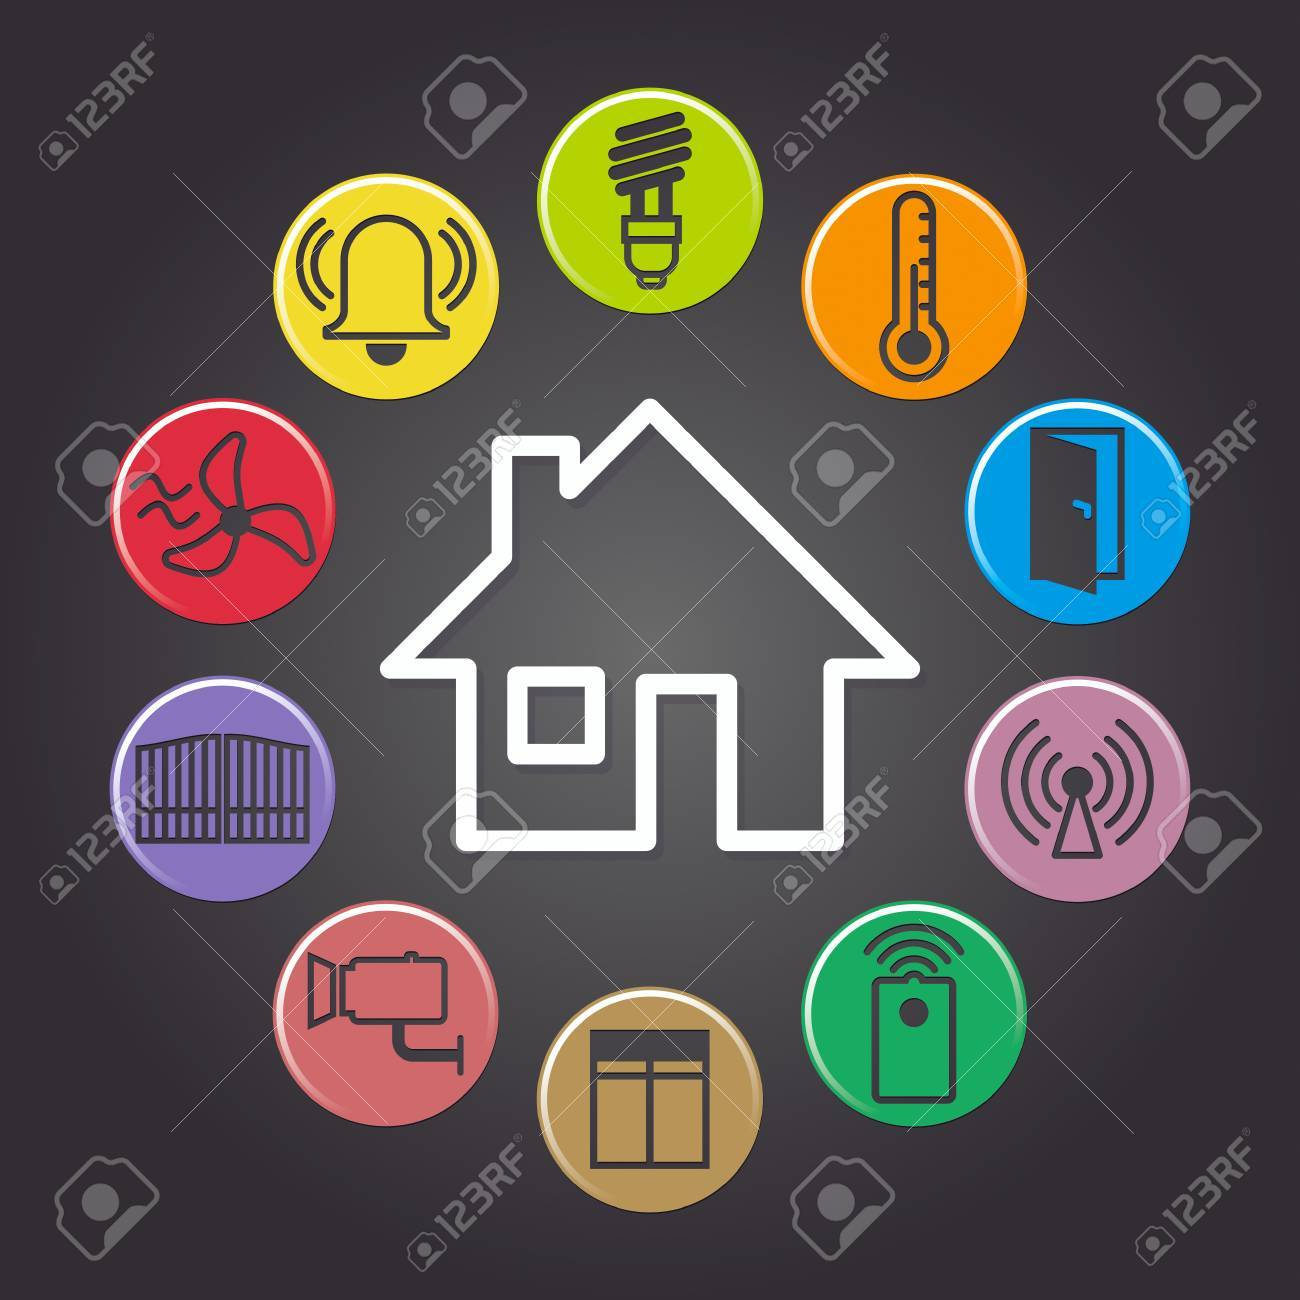 illustration of background symbolizing the smart home - 48675436